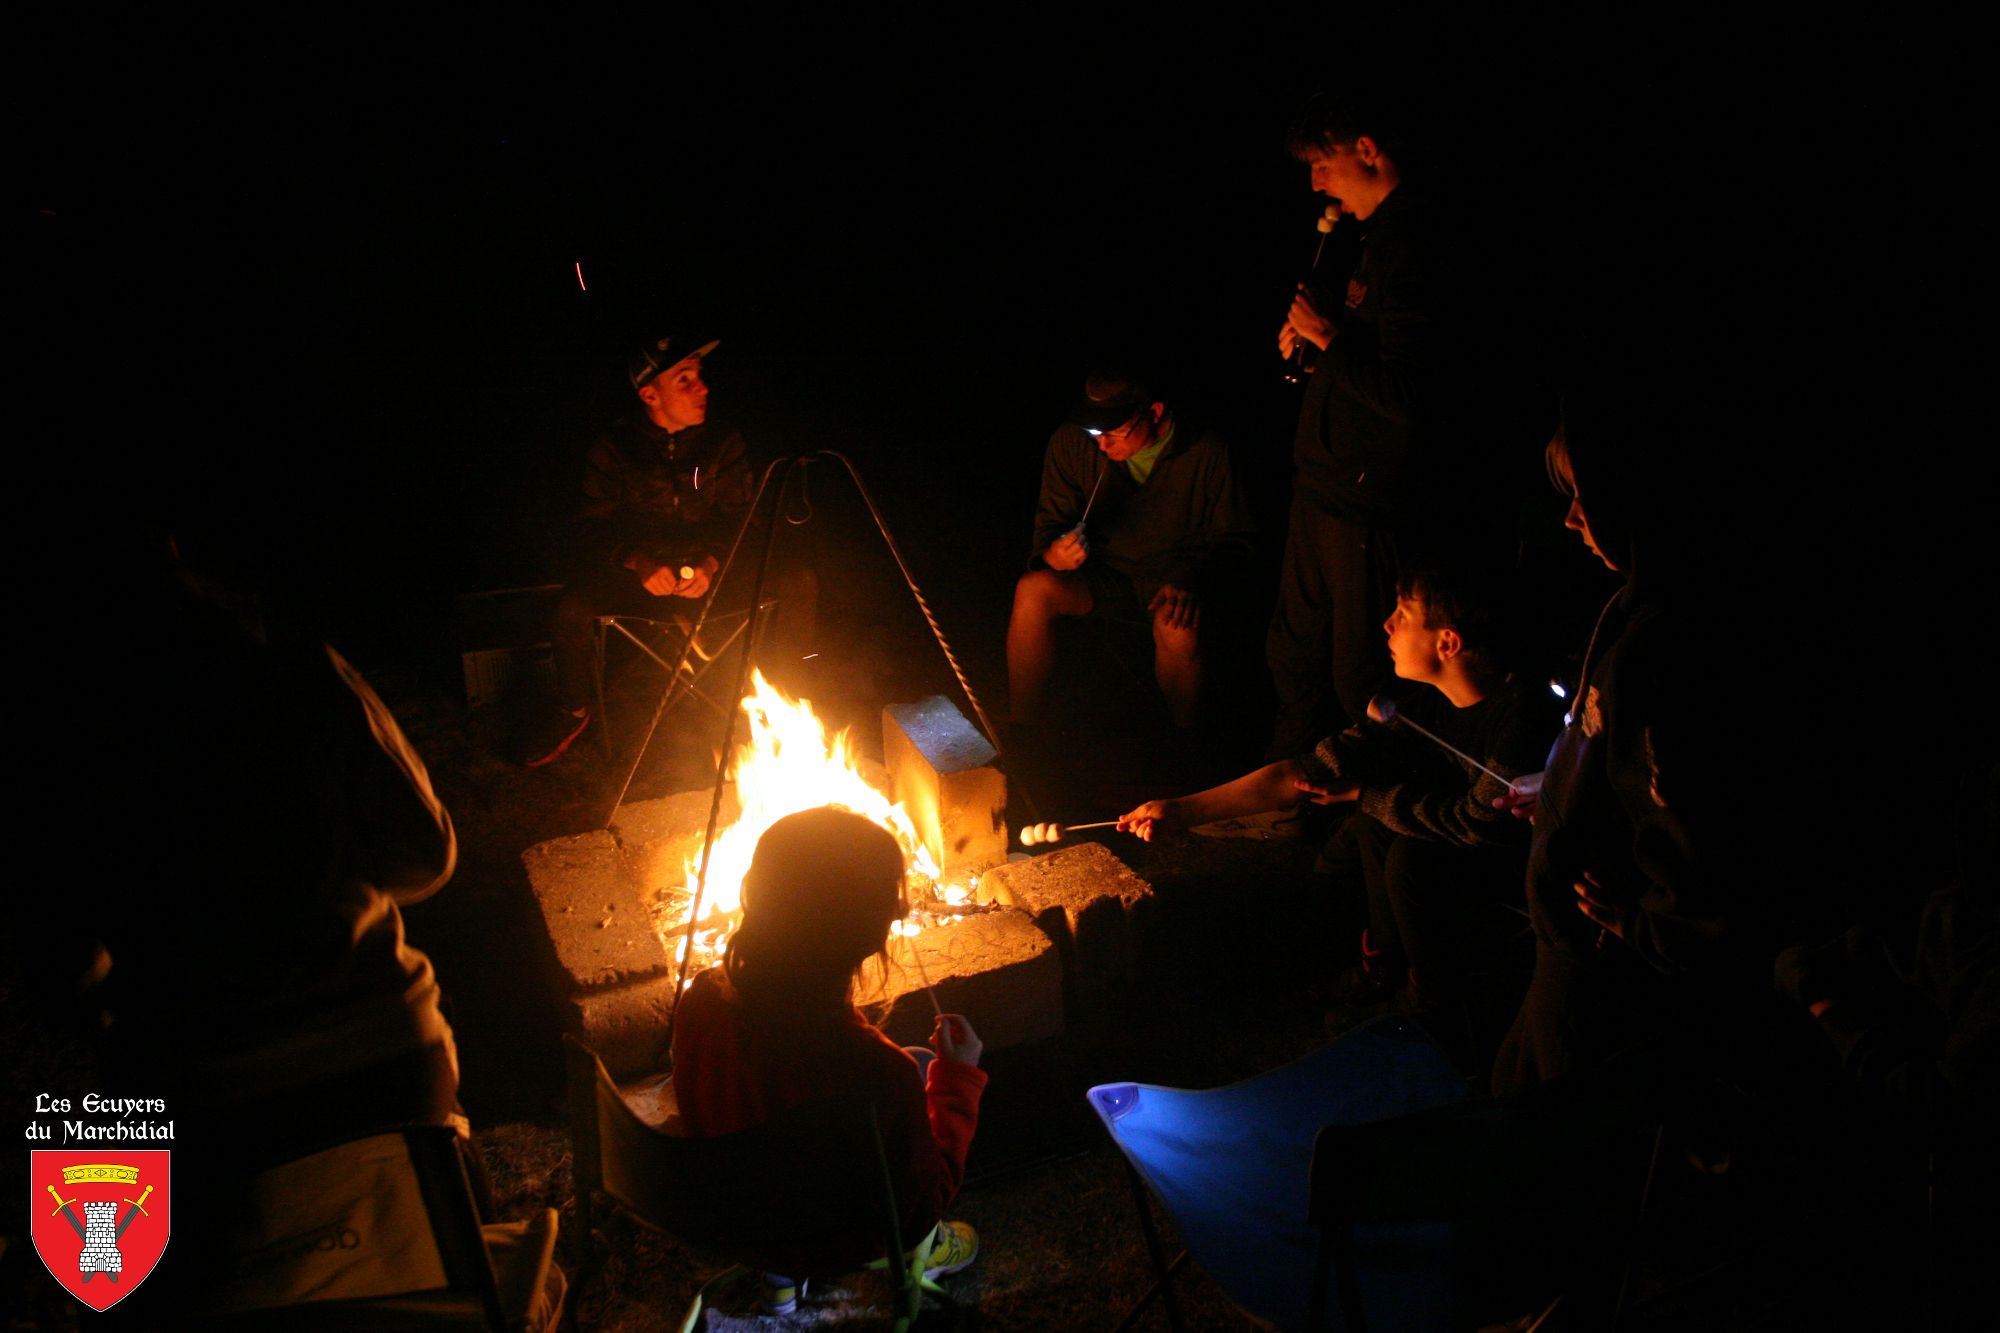 2020-06-01_Camping_Gourdon-35-www.marchidial.fr_